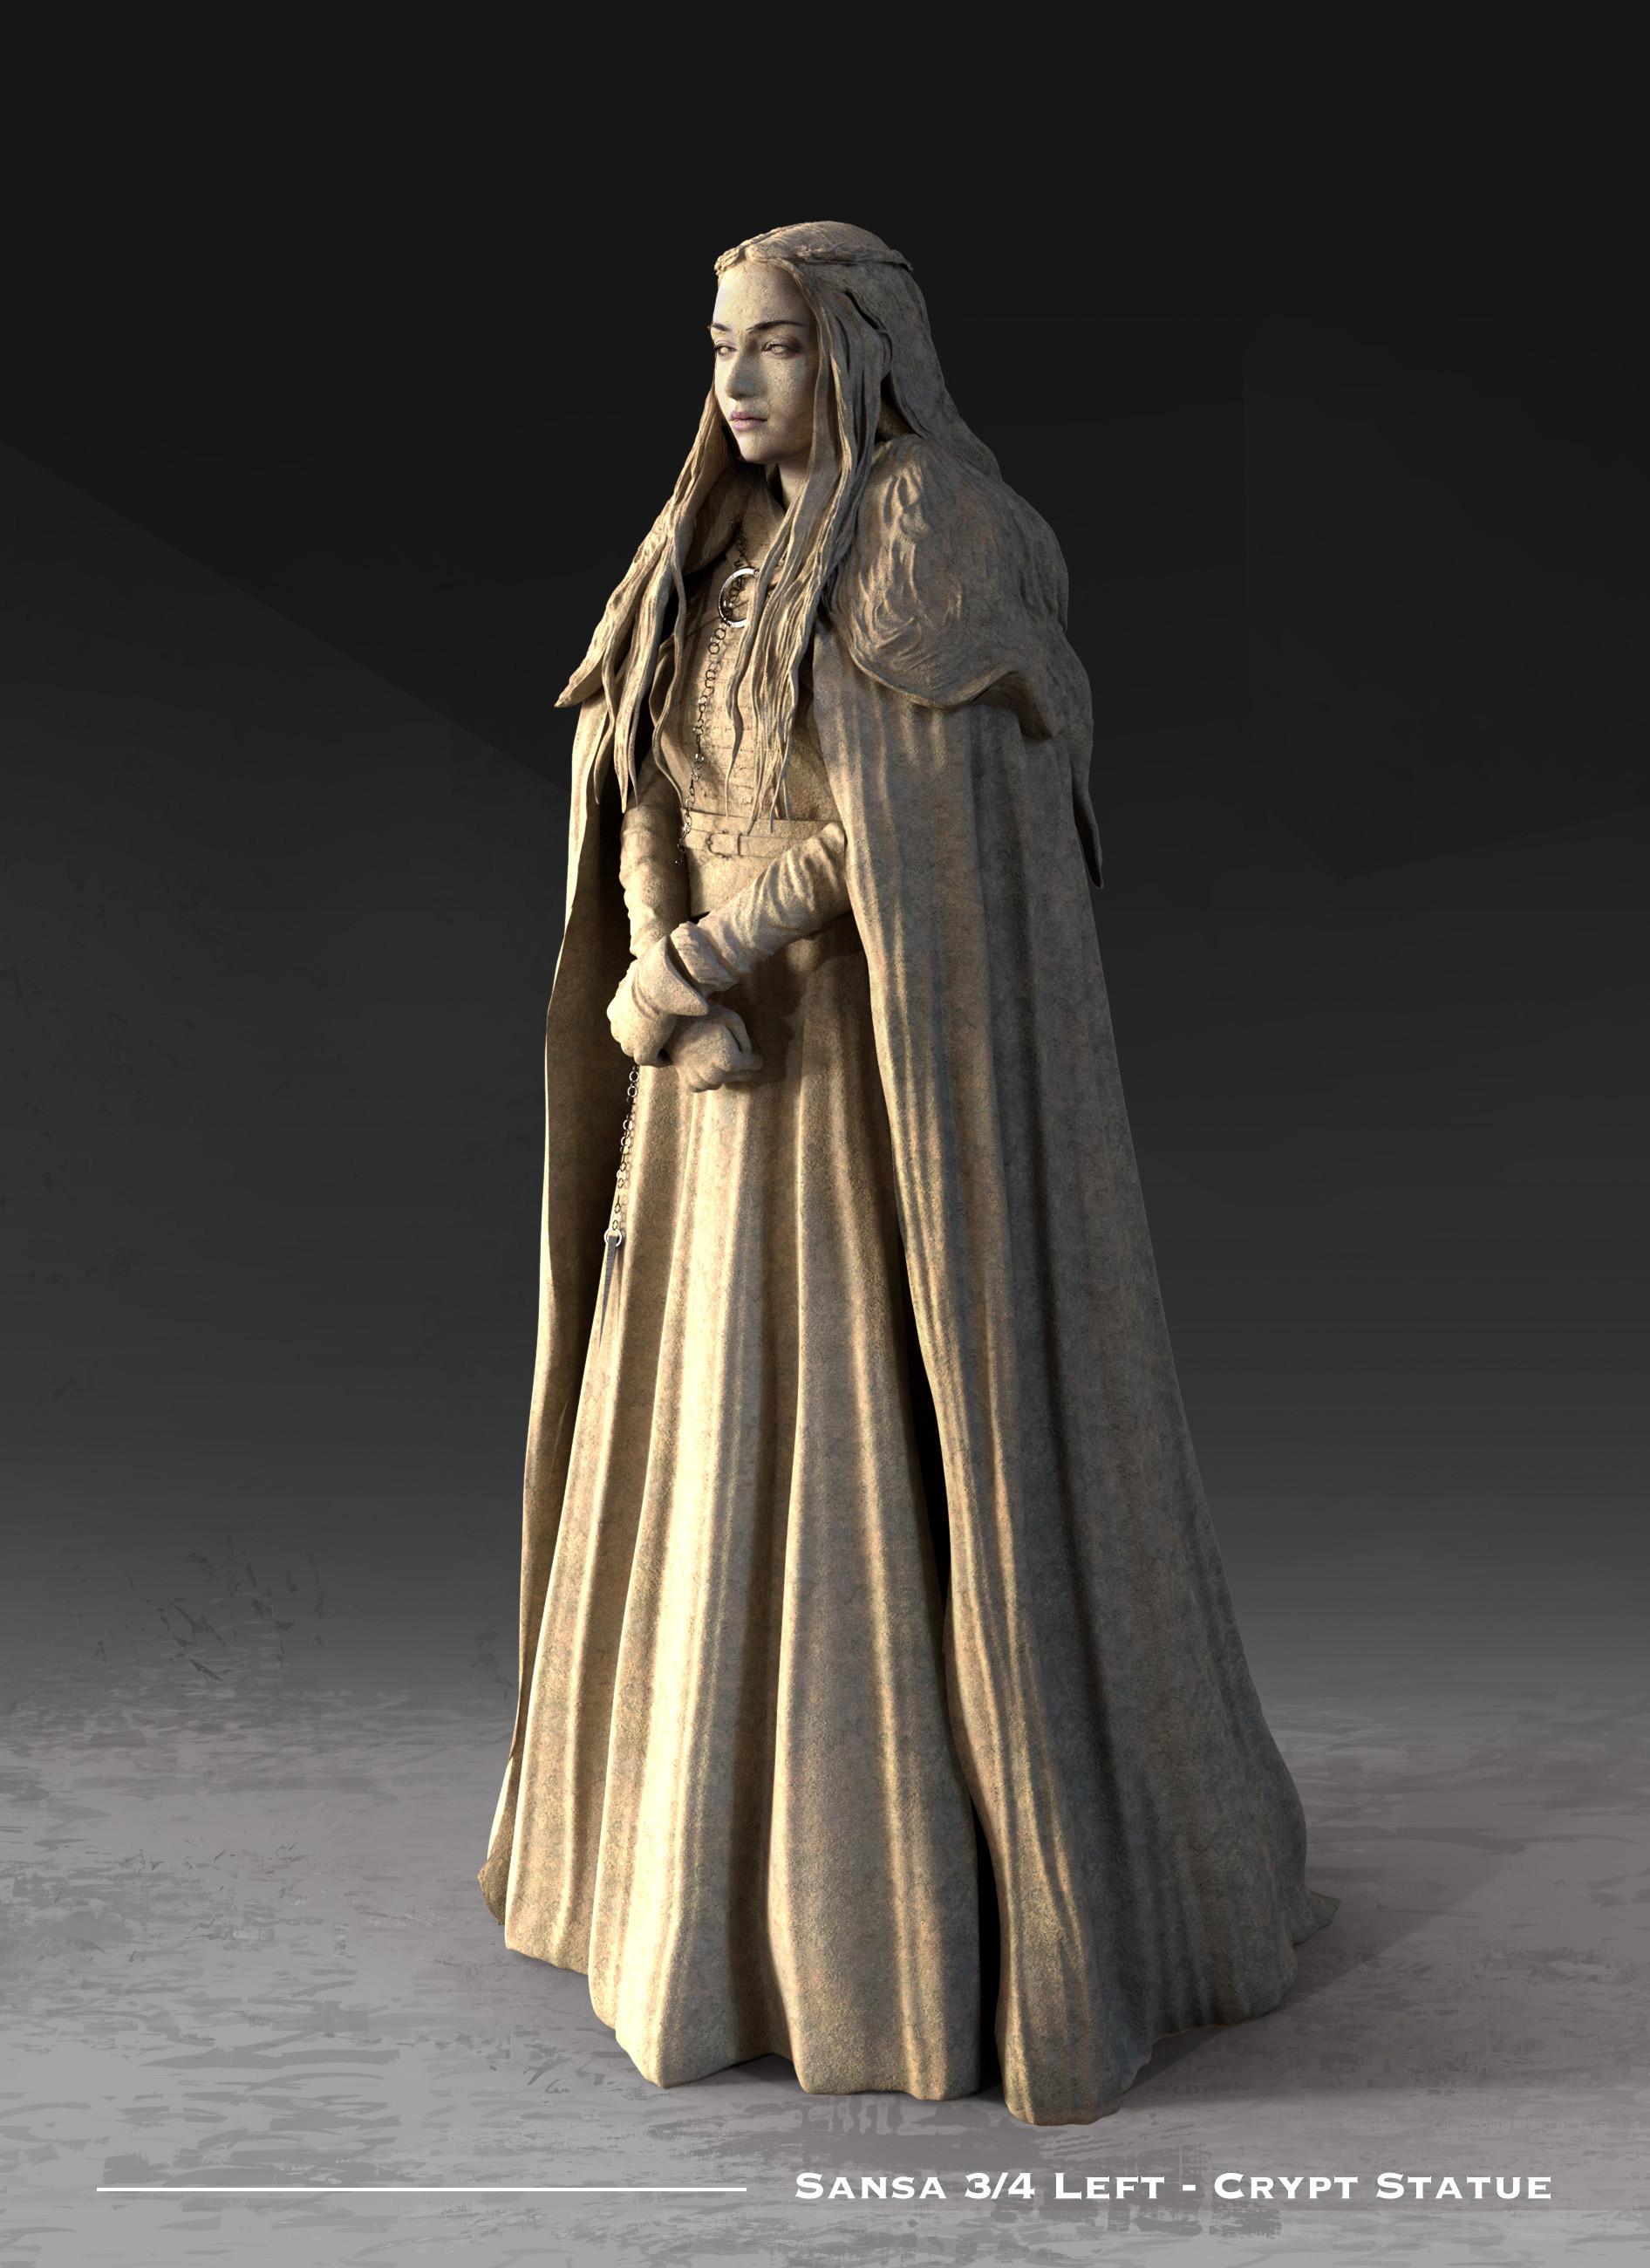 Kieran belshaw sansa statue 3quarterleft v001